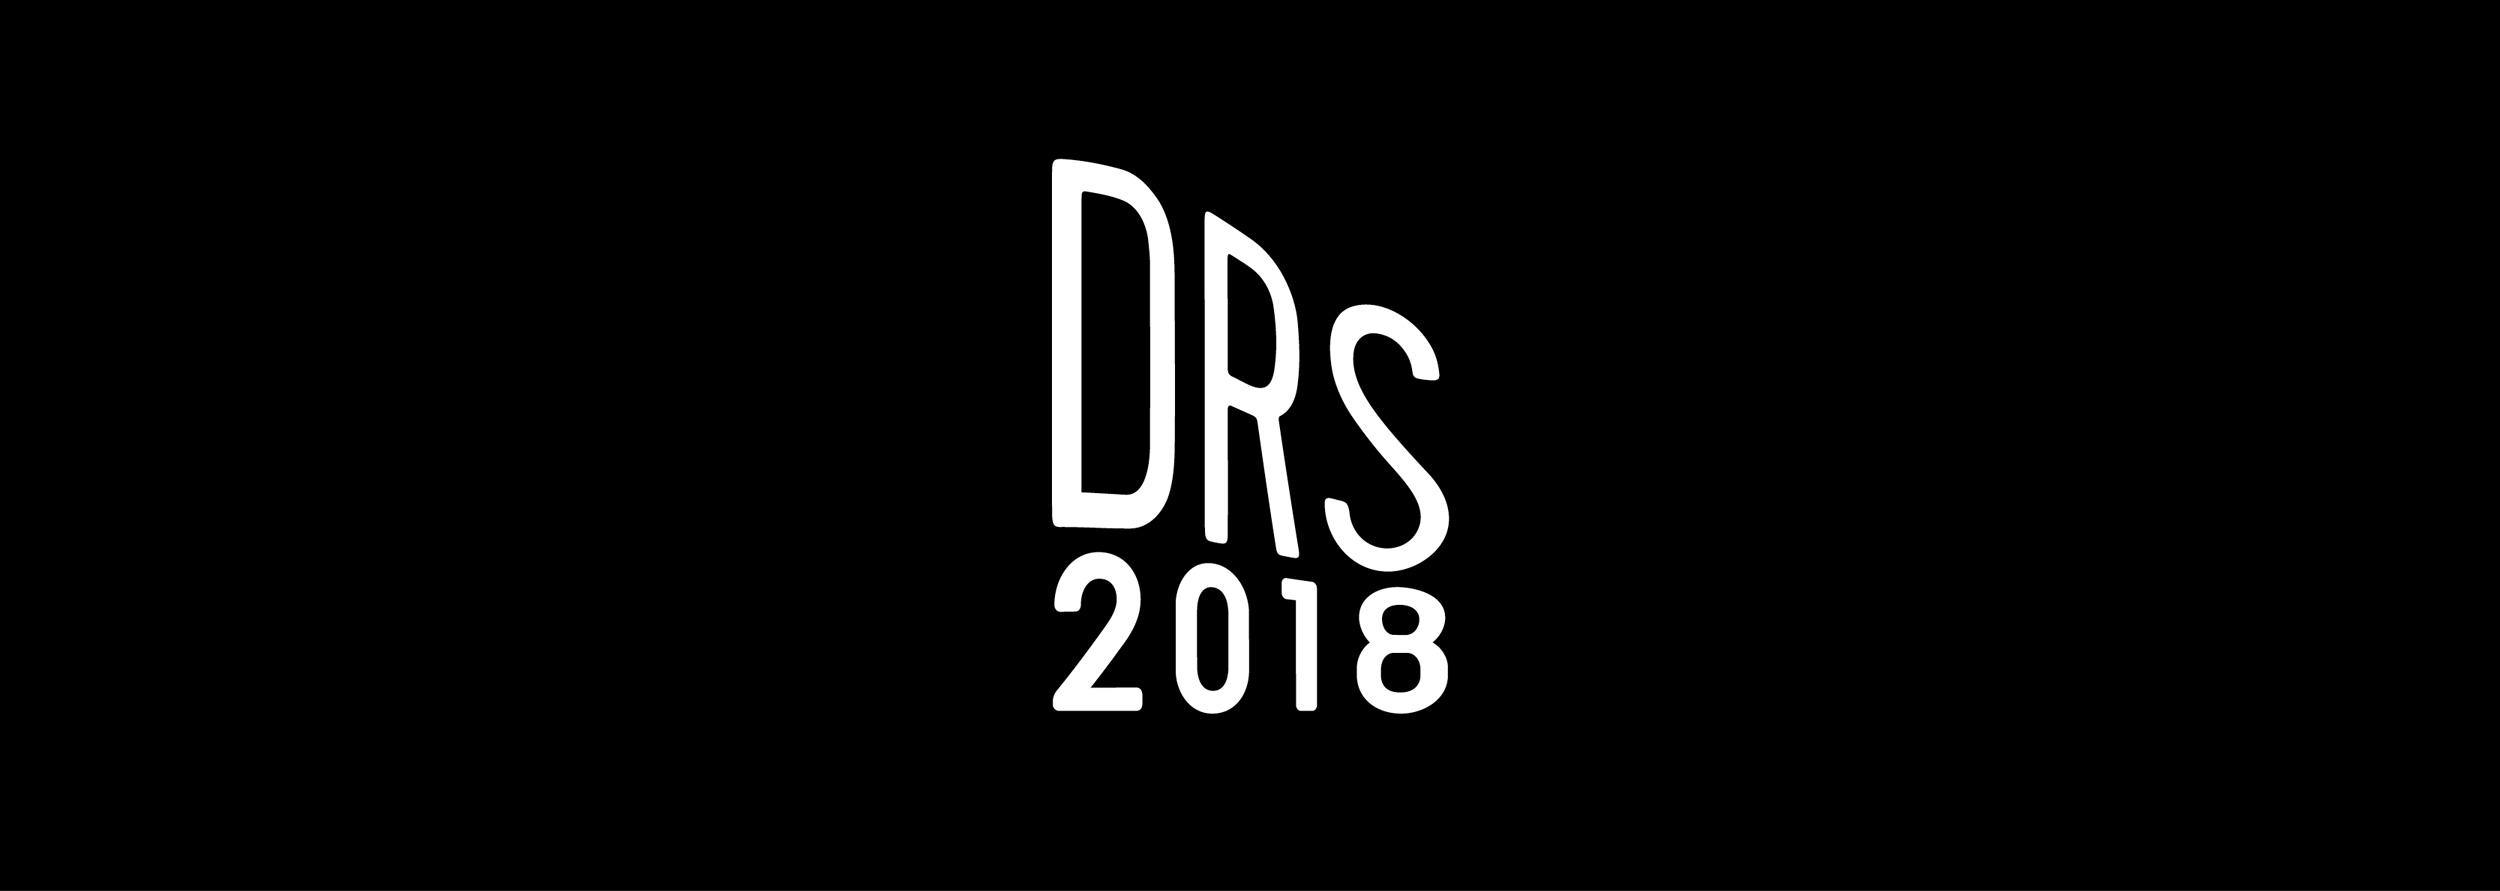 DRS2018 Brand Development